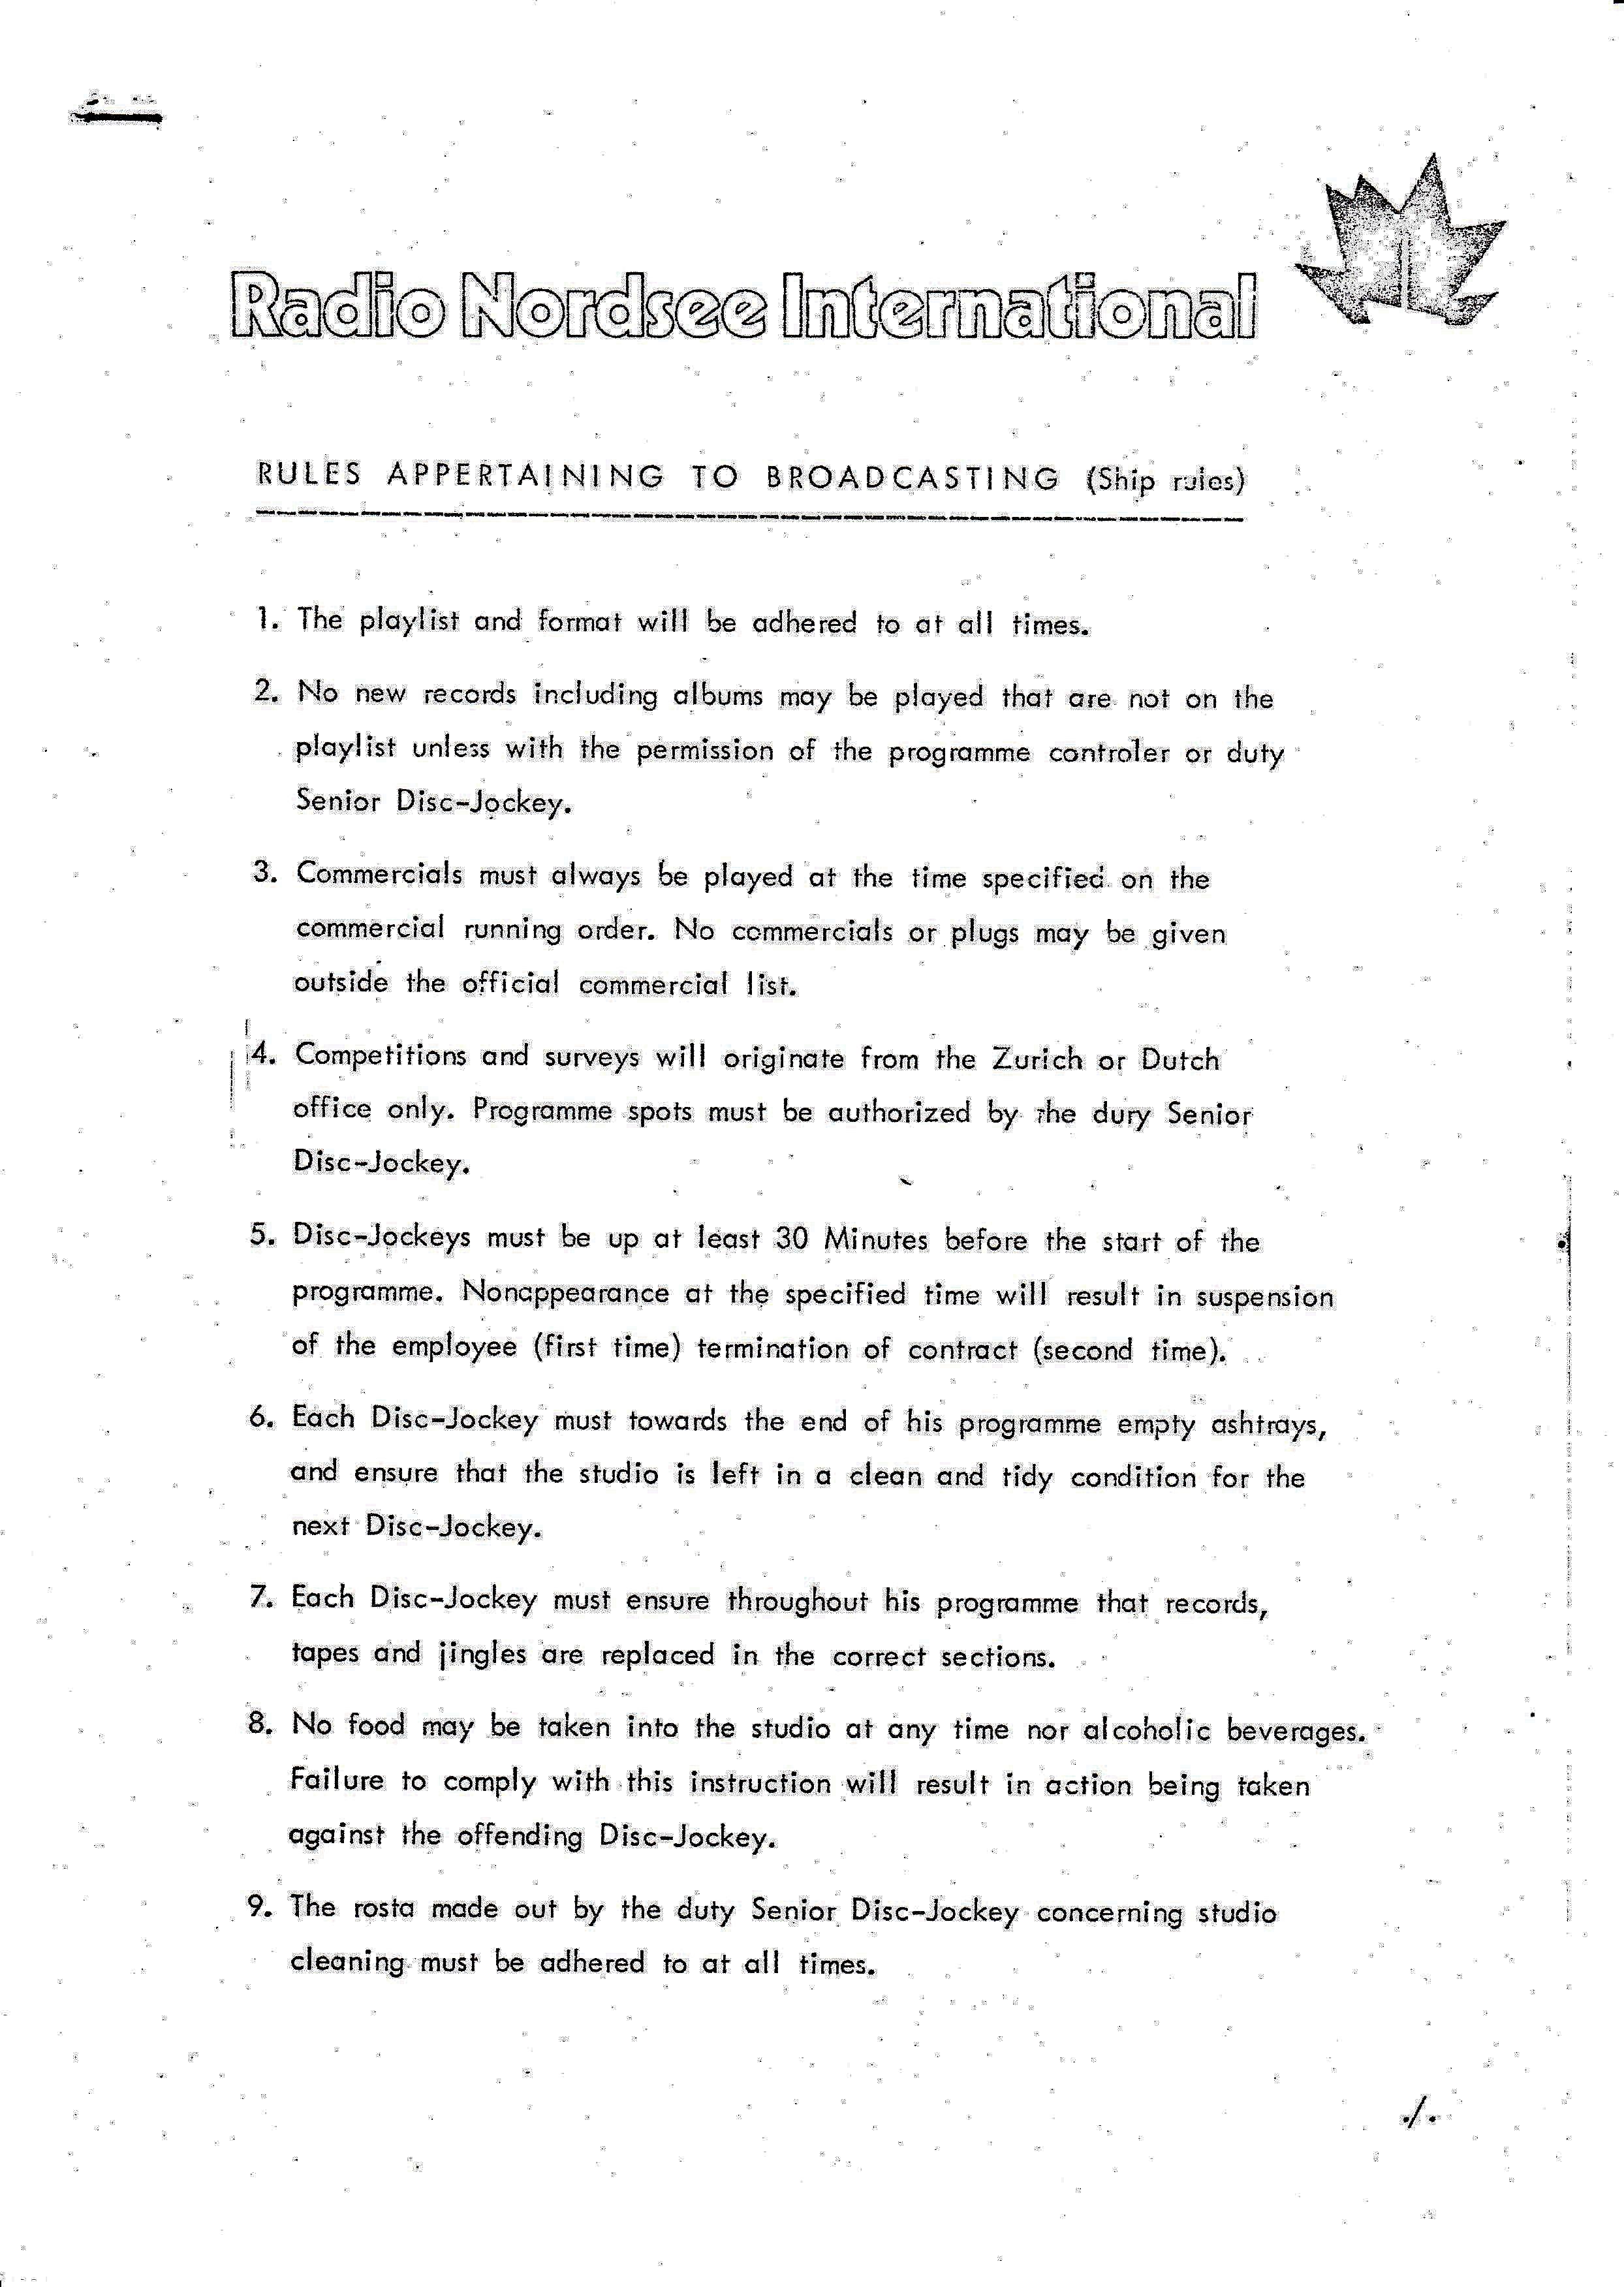 RNI Rules P1-2